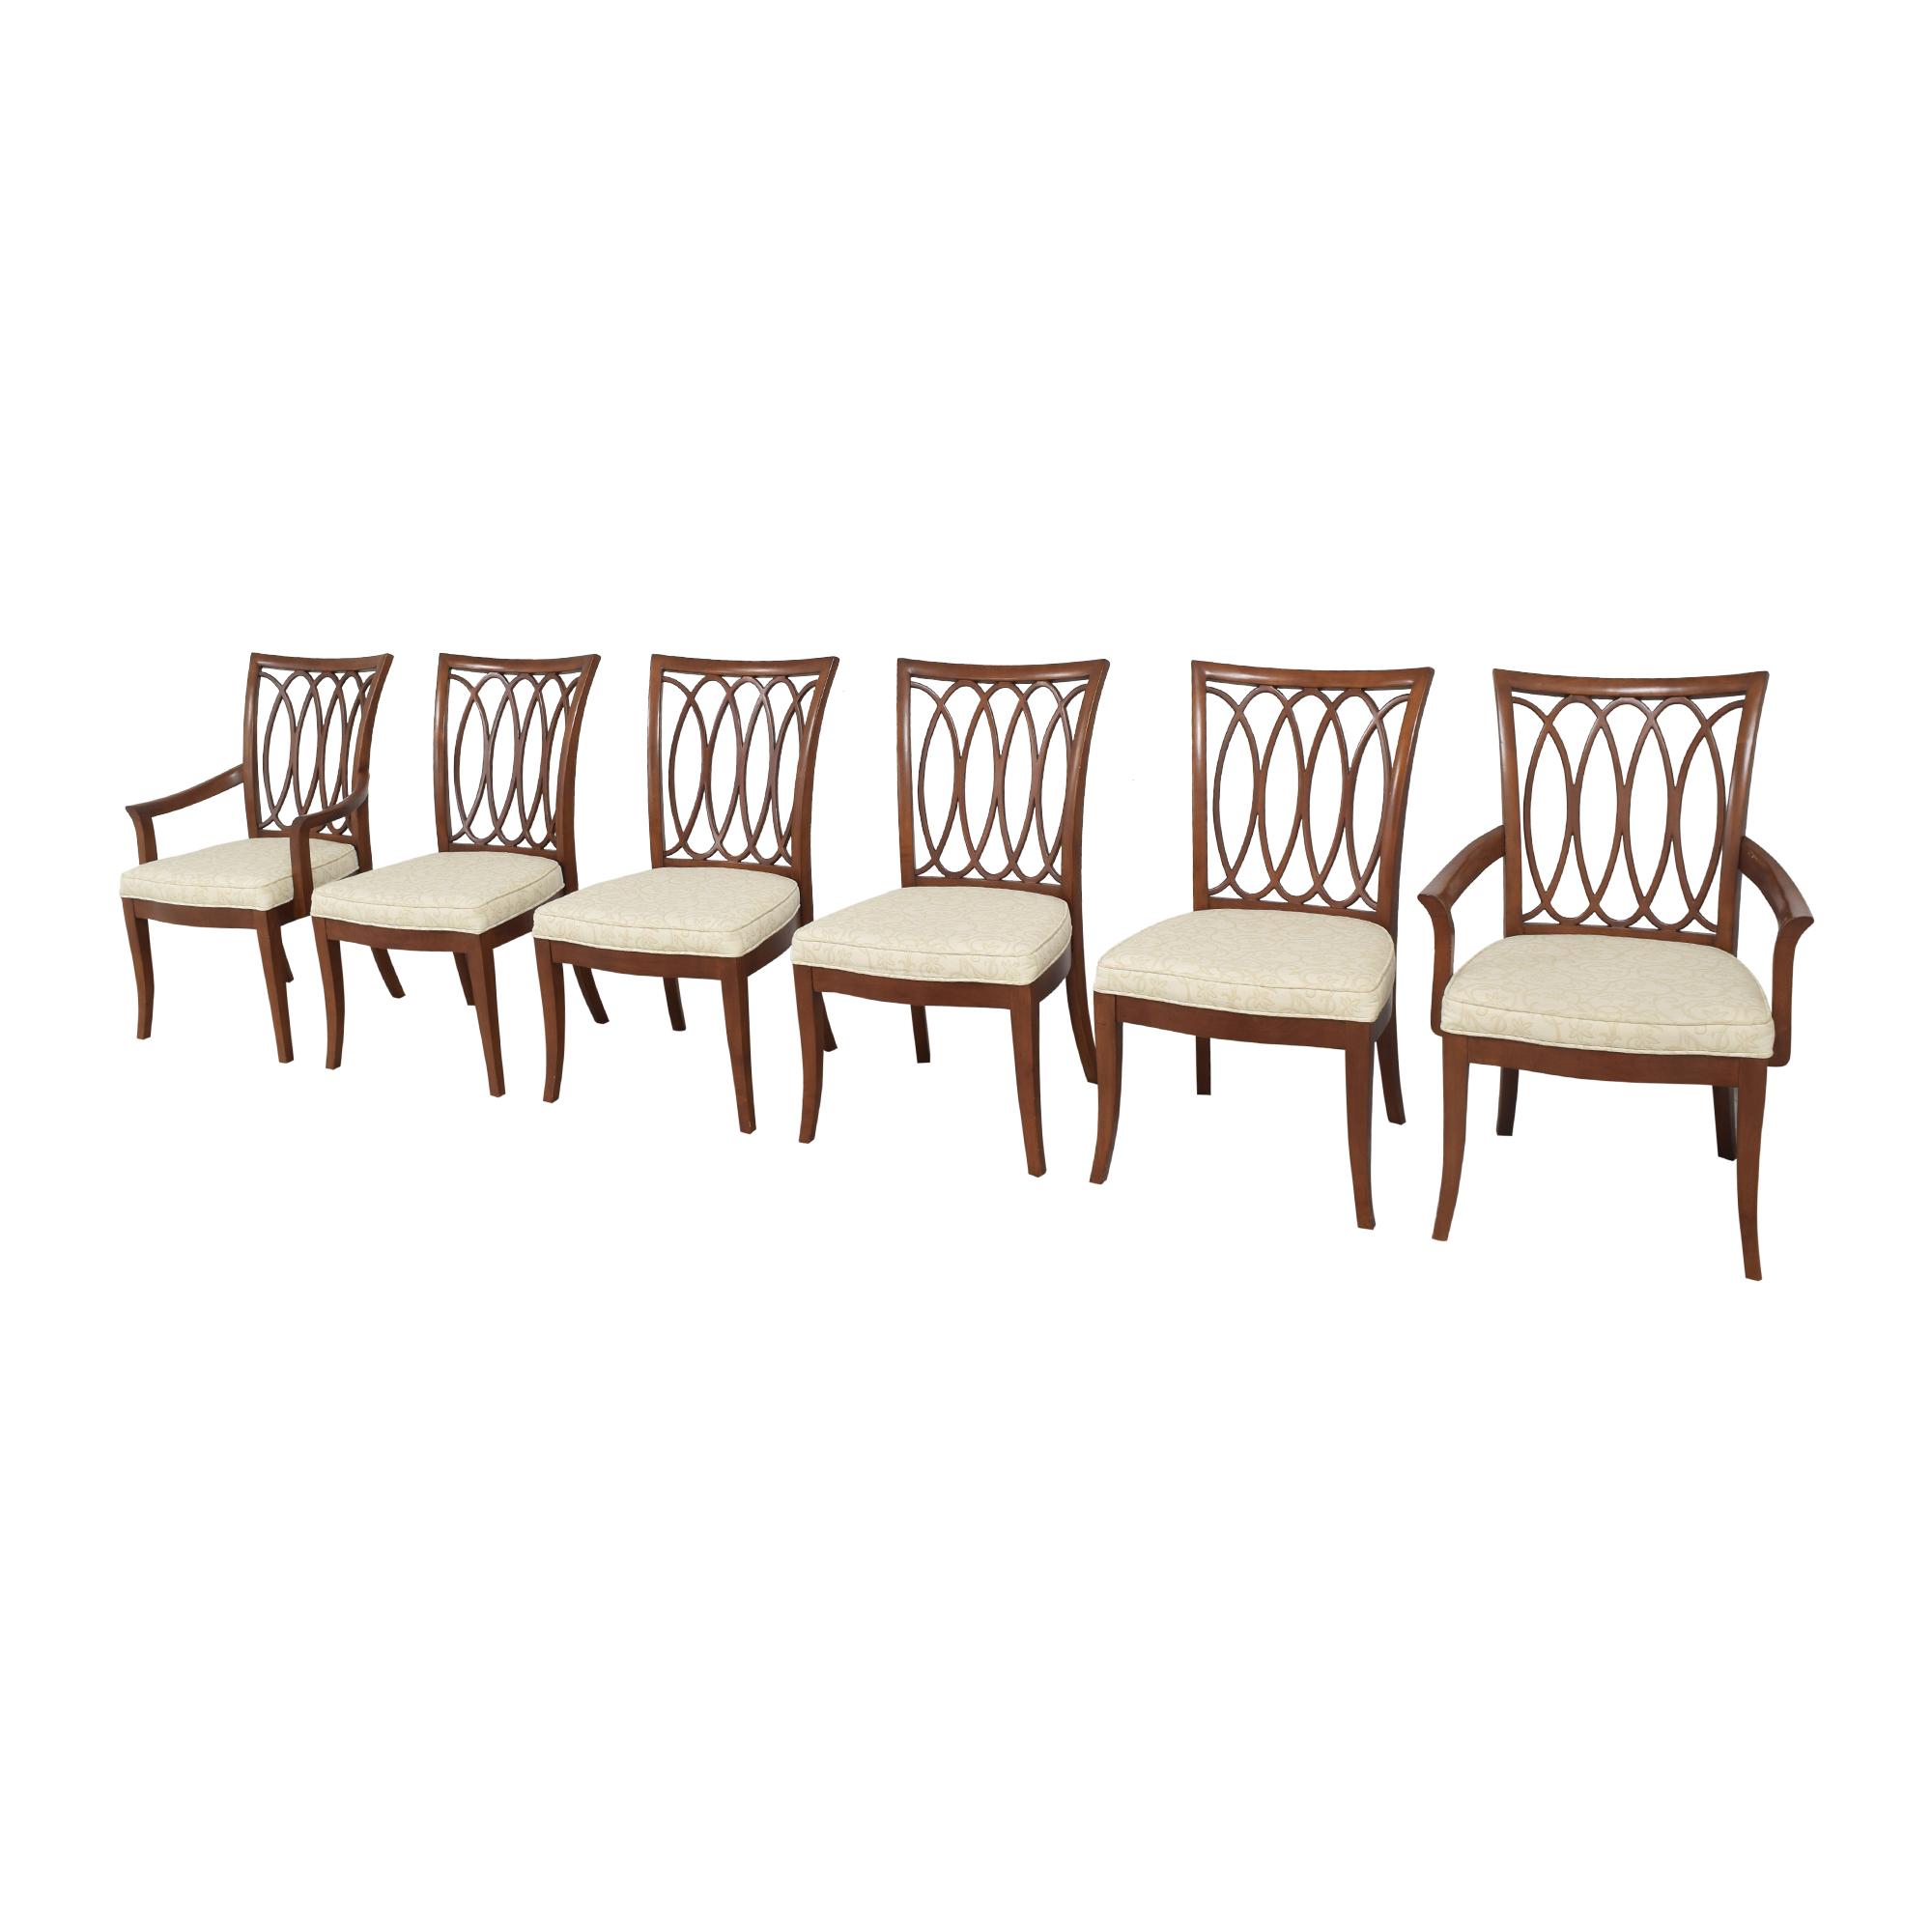 Stanley Furniture Stanley Furniture Hudson Street Dining Chairs nj